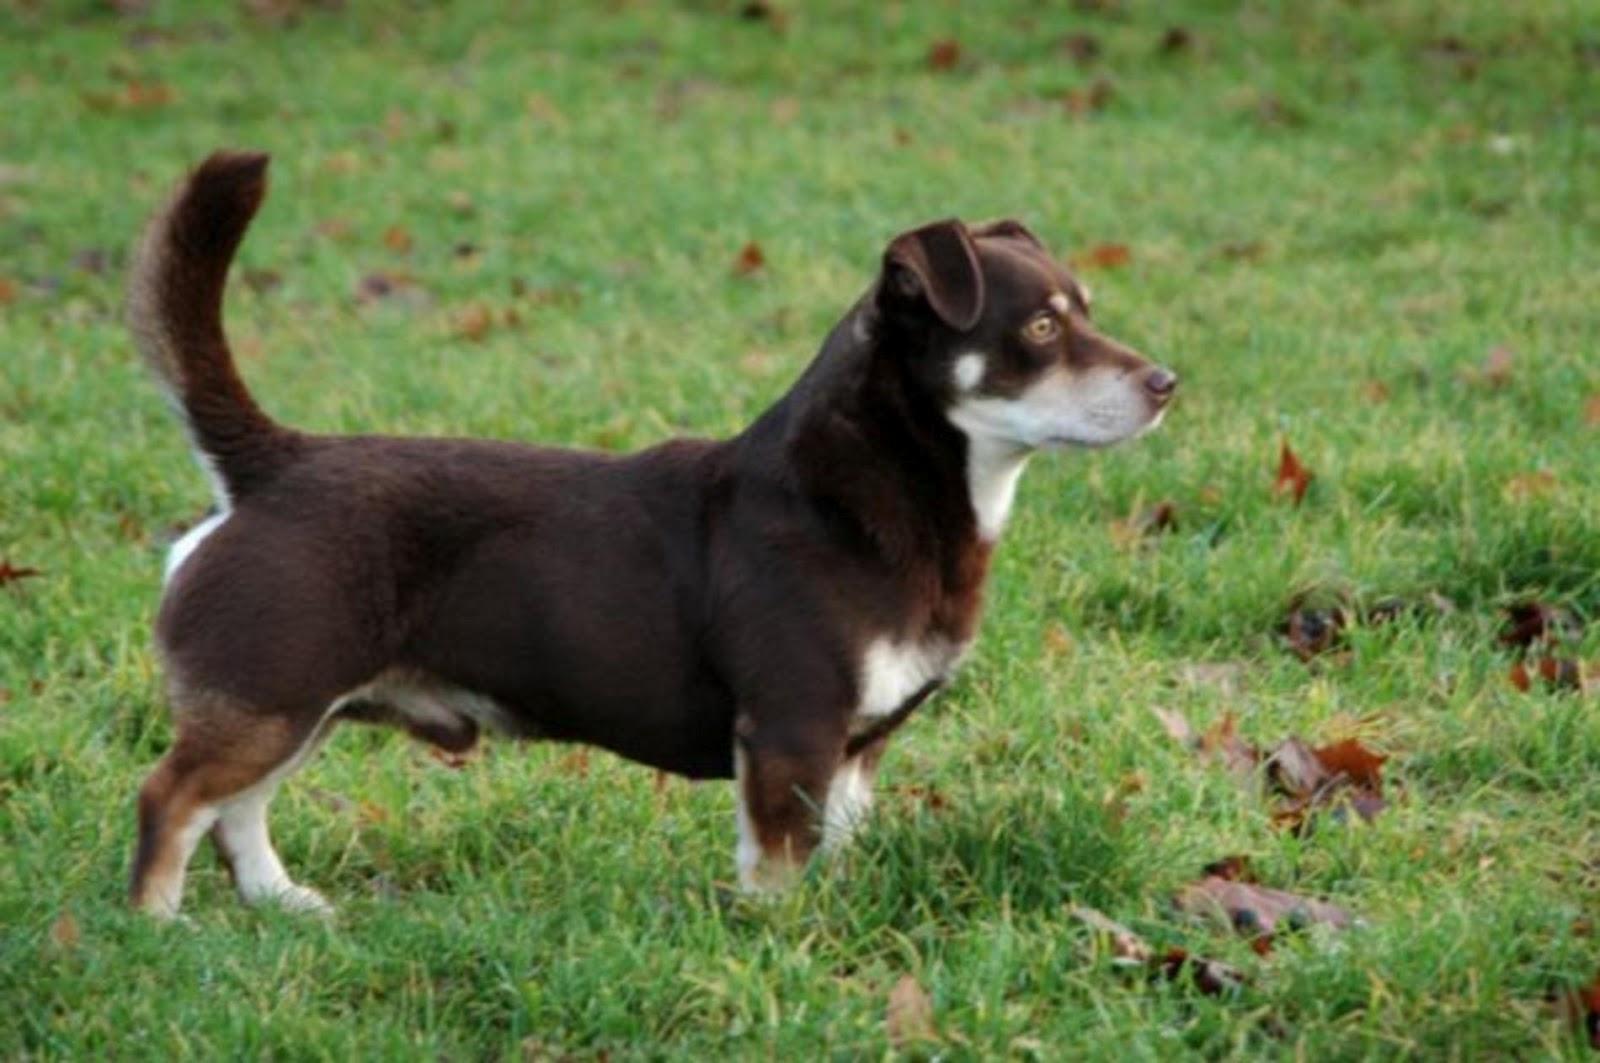 Lancashire Heeler | The Life of Animals